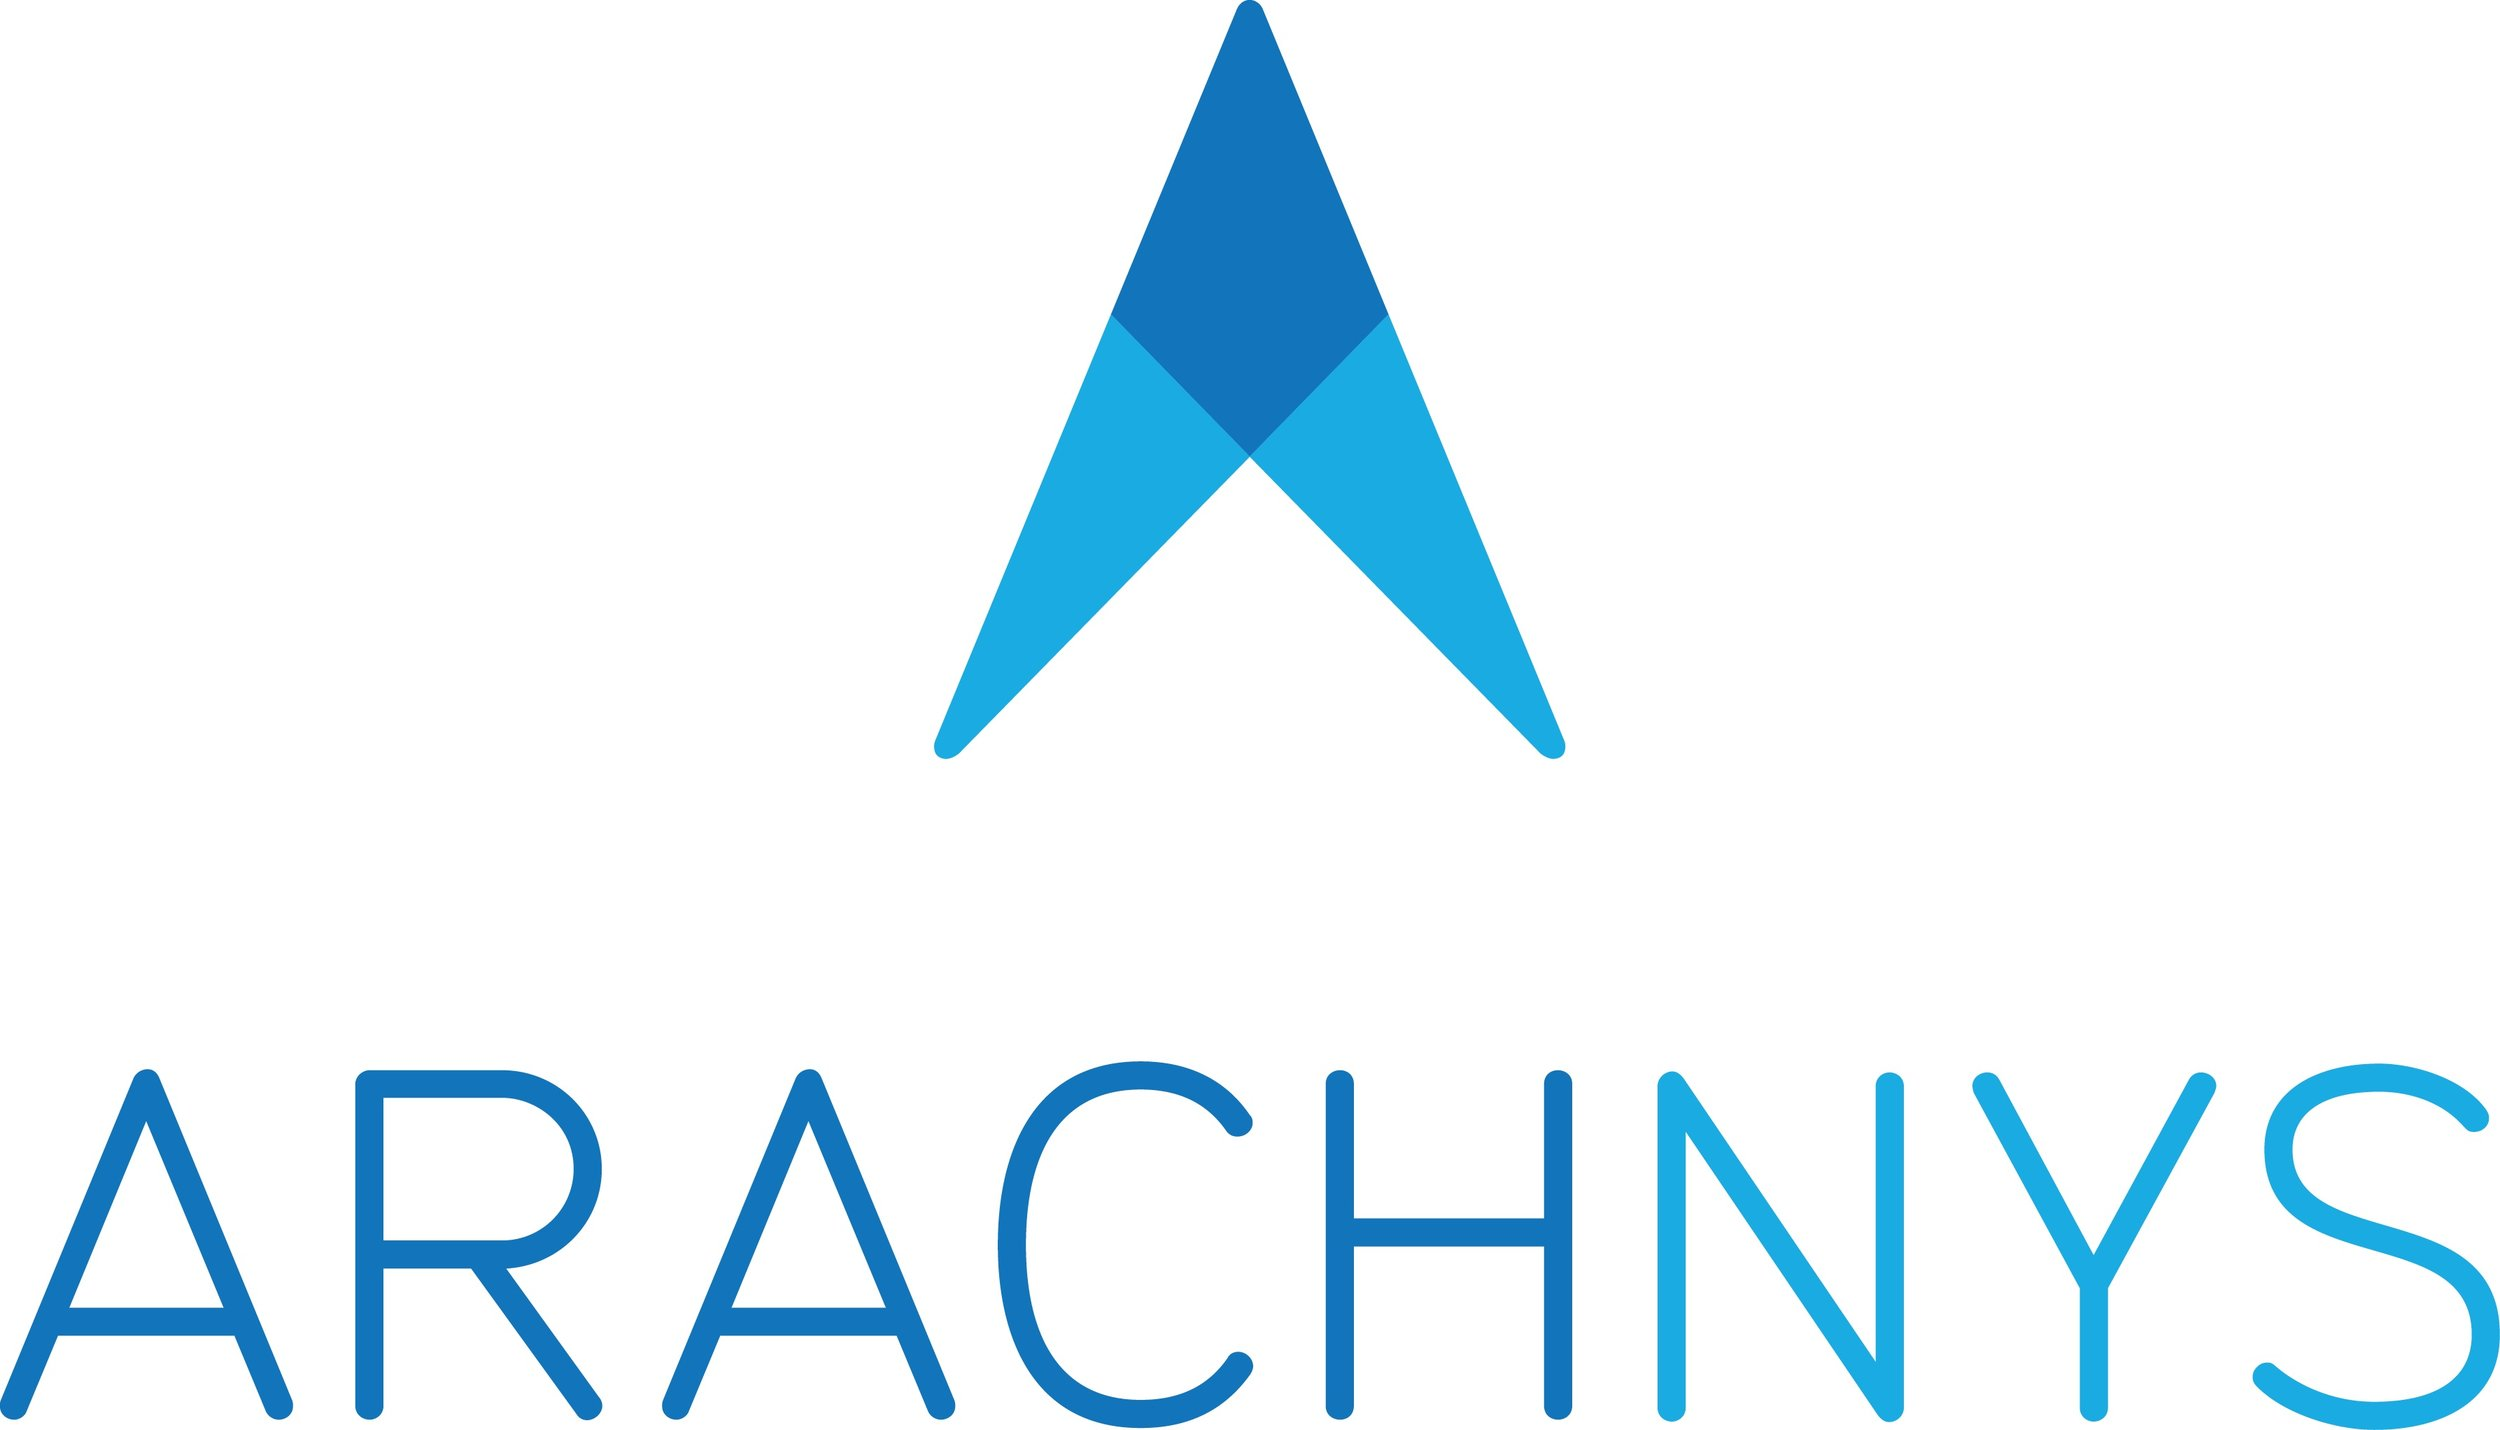 Arachnys - Primary White Background RGB.jpg